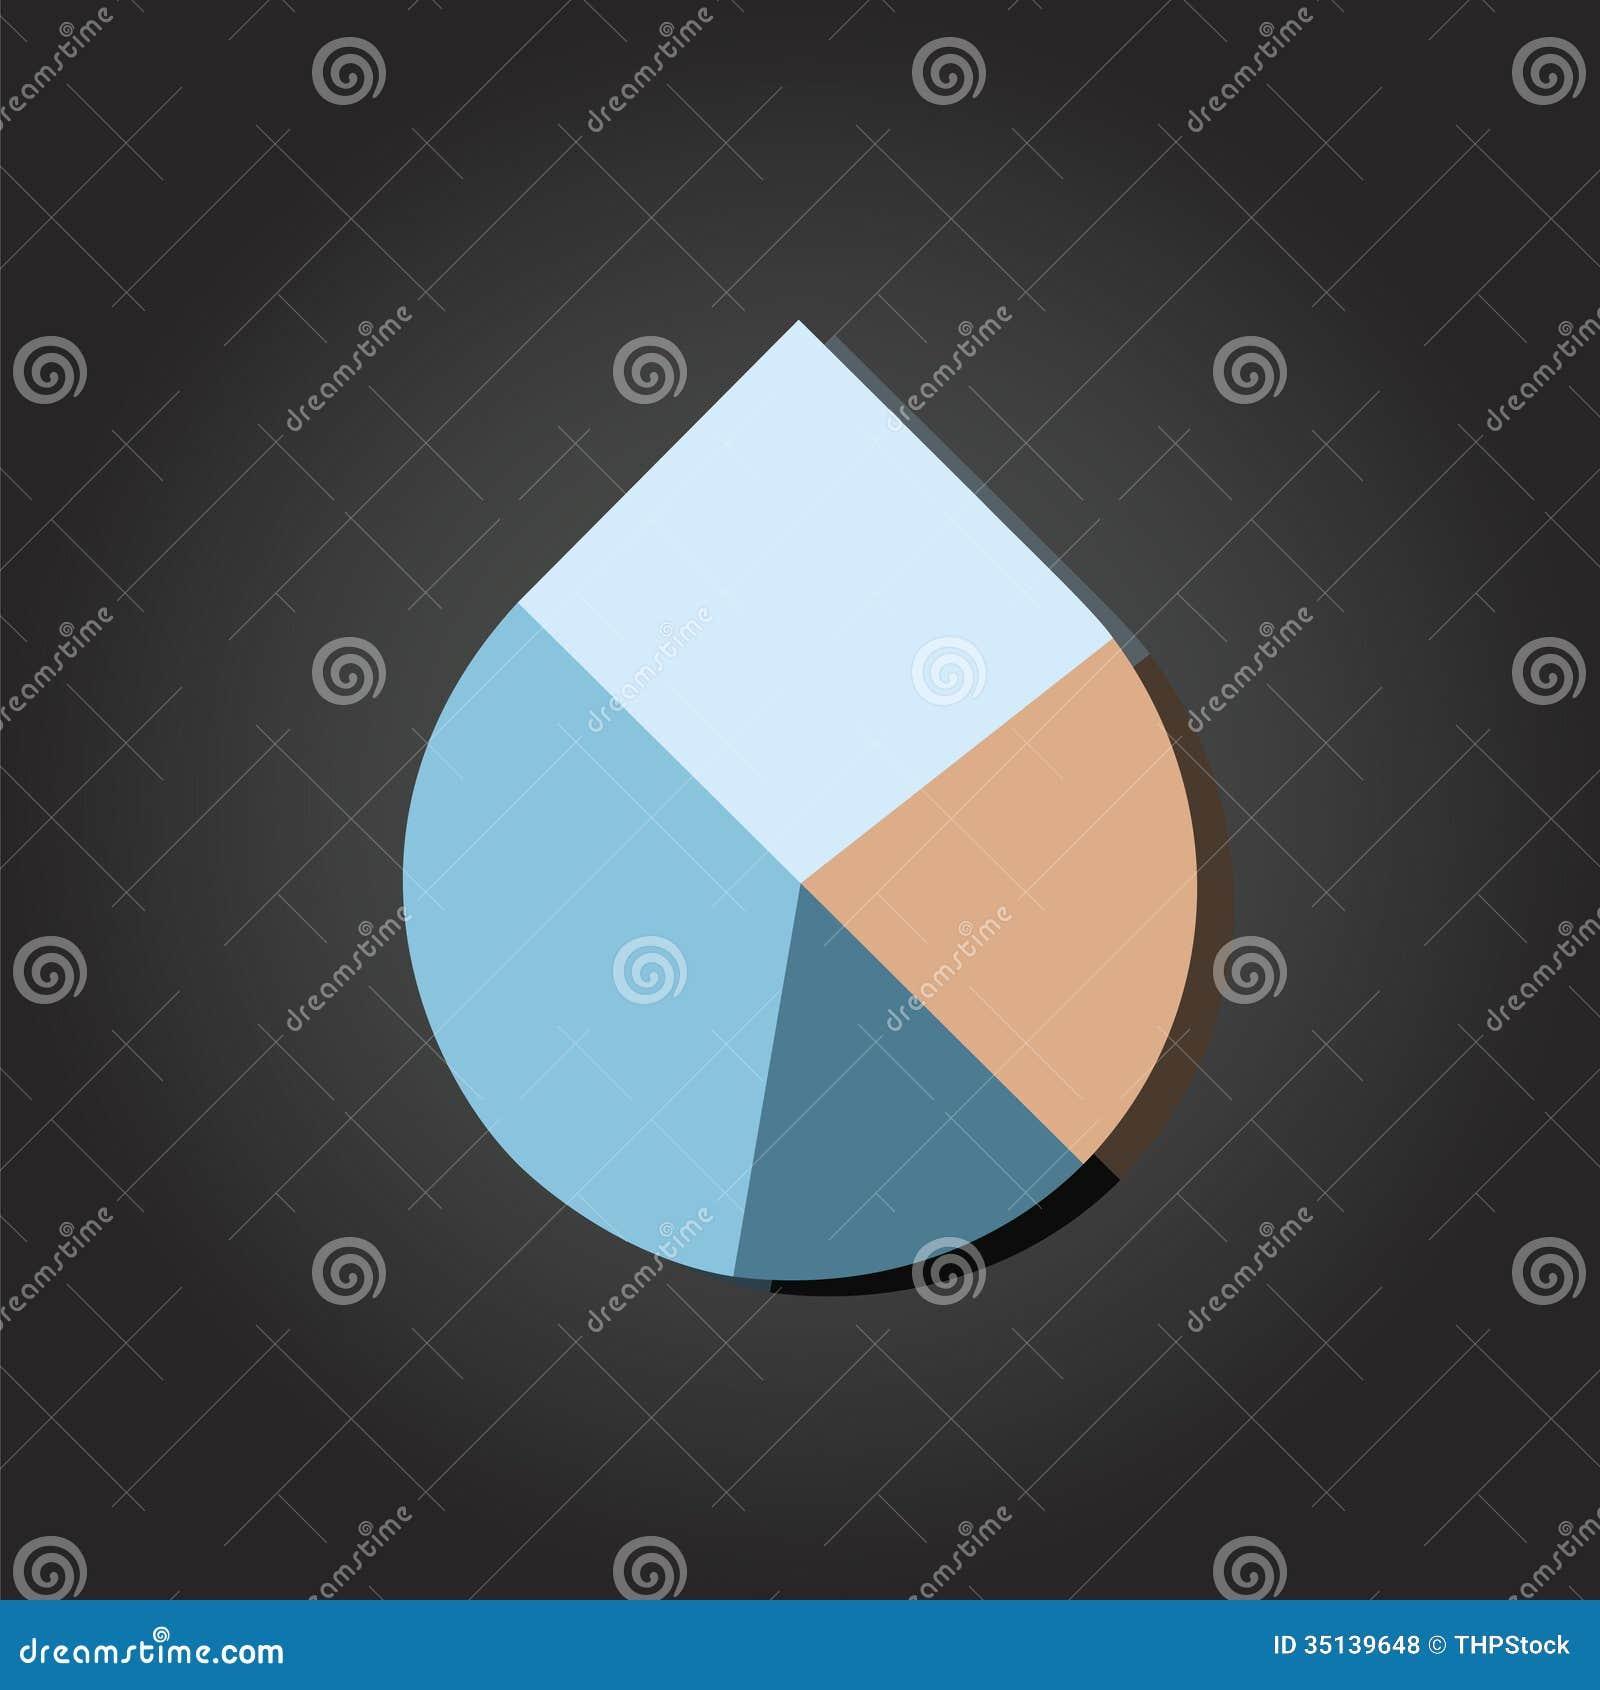 Water drop pie chart vector stock vector illustration of flat download water drop pie chart vector stock vector illustration of flat cycle 35139648 ccuart Choice Image